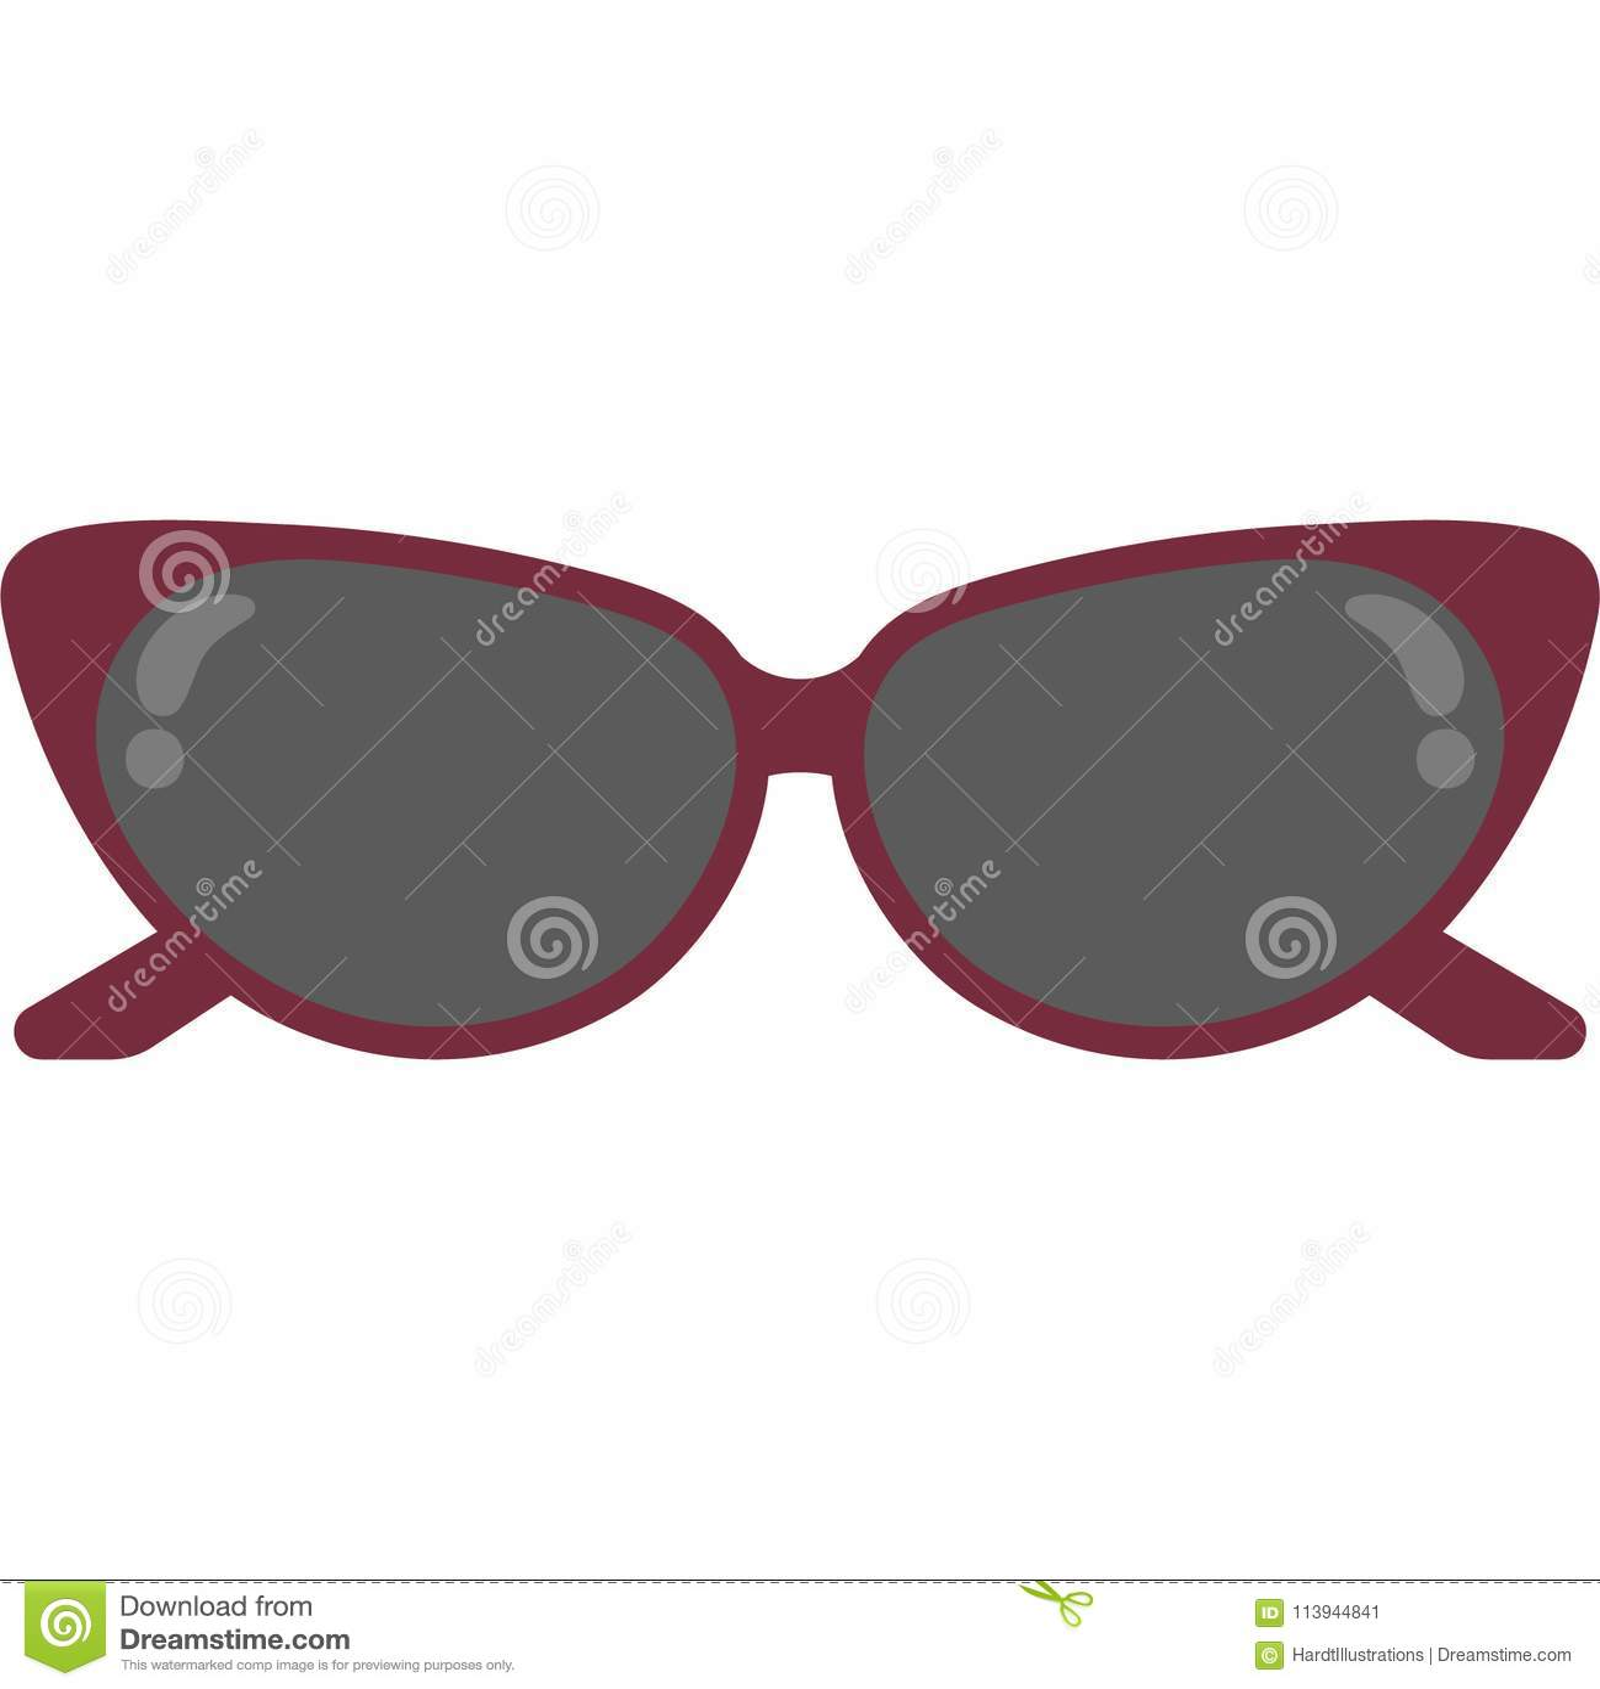 e65e2cf61e9 Cat Eye Sunglasses Vector Illustration Stock Vector - Illustration ...